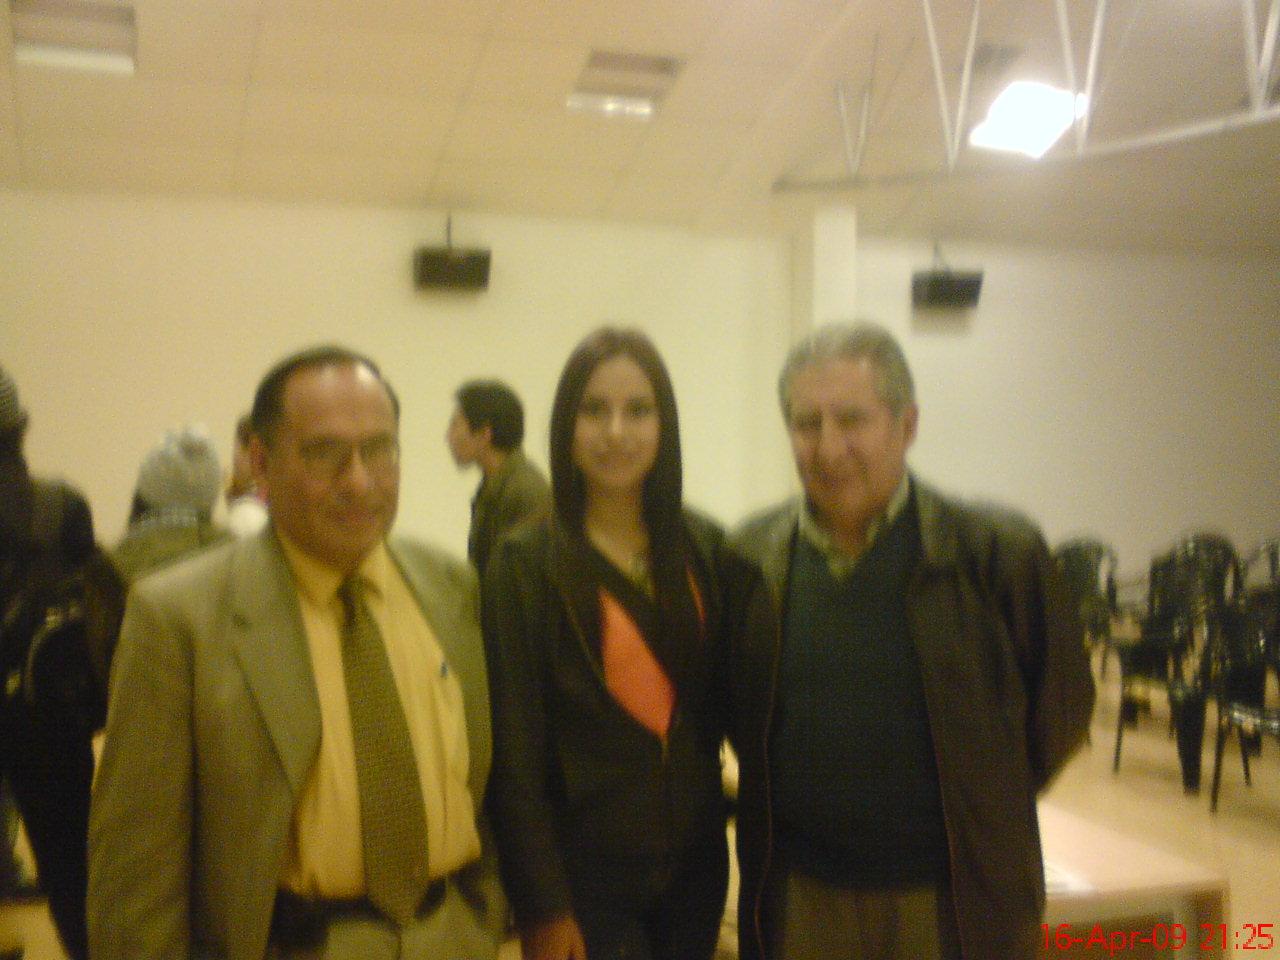 [Don+Antonio+Eguino,+Srta.+Mariana+Liquitaya,+y+Yo+(Leonidas+Zegarra]]